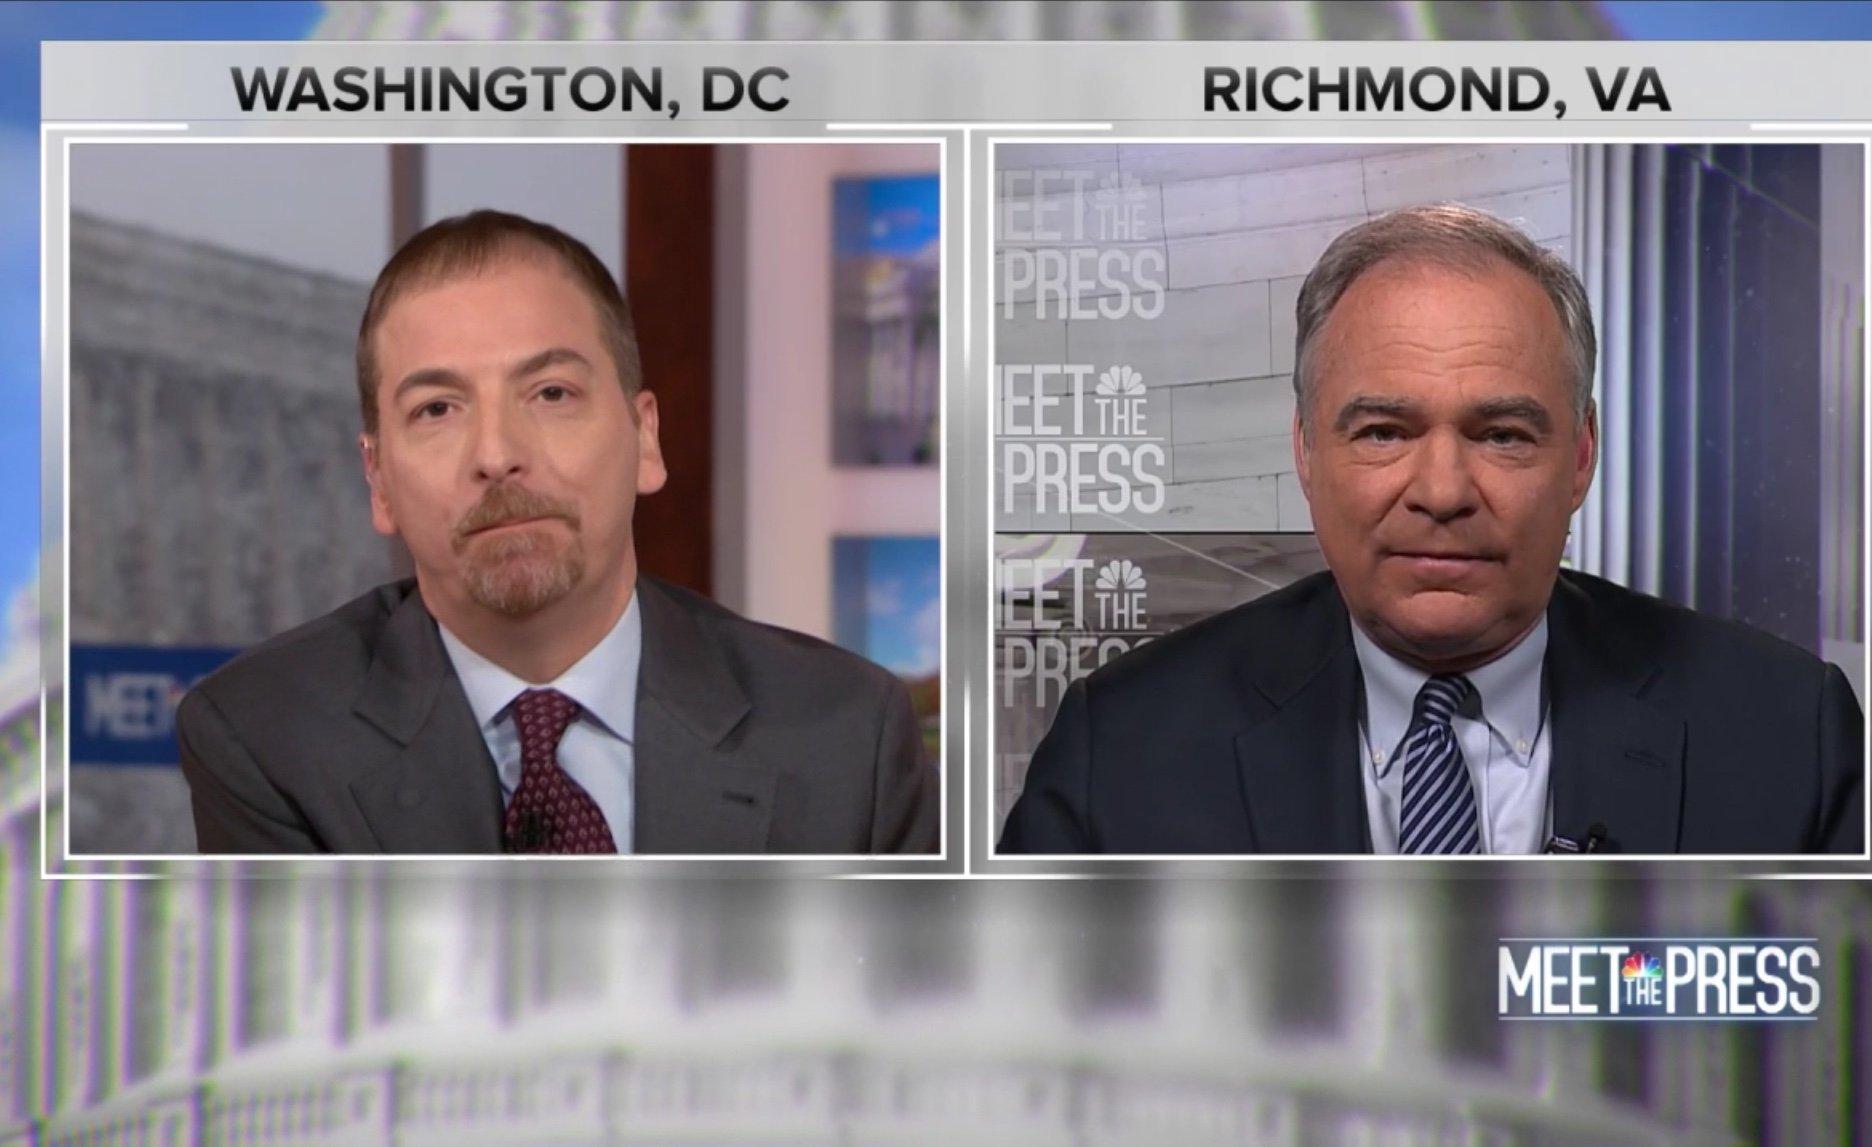 Virginia Democratic Sen. Tim Kaine is interviewed on NBC's Meet the Press, Jan. 13, 2019. NBC News screenshot.